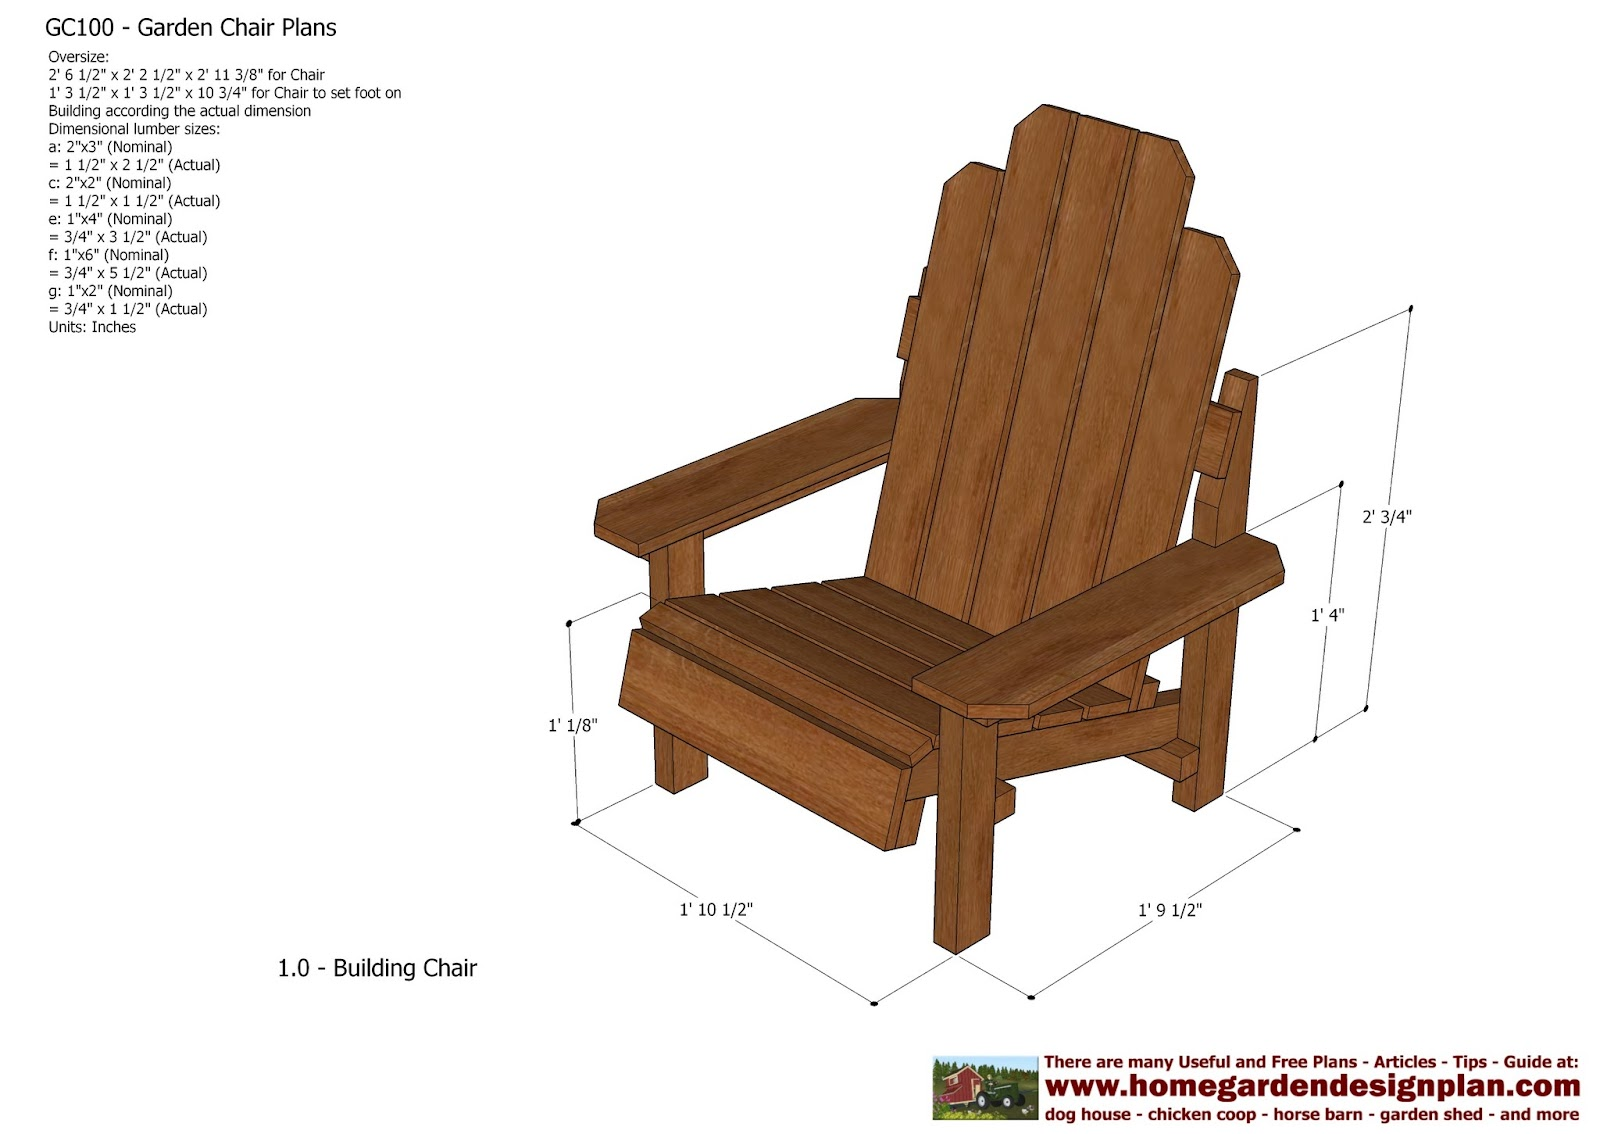 garden plans: GC100 - Garden Chair Plans - Out Door Furniture Plans ...